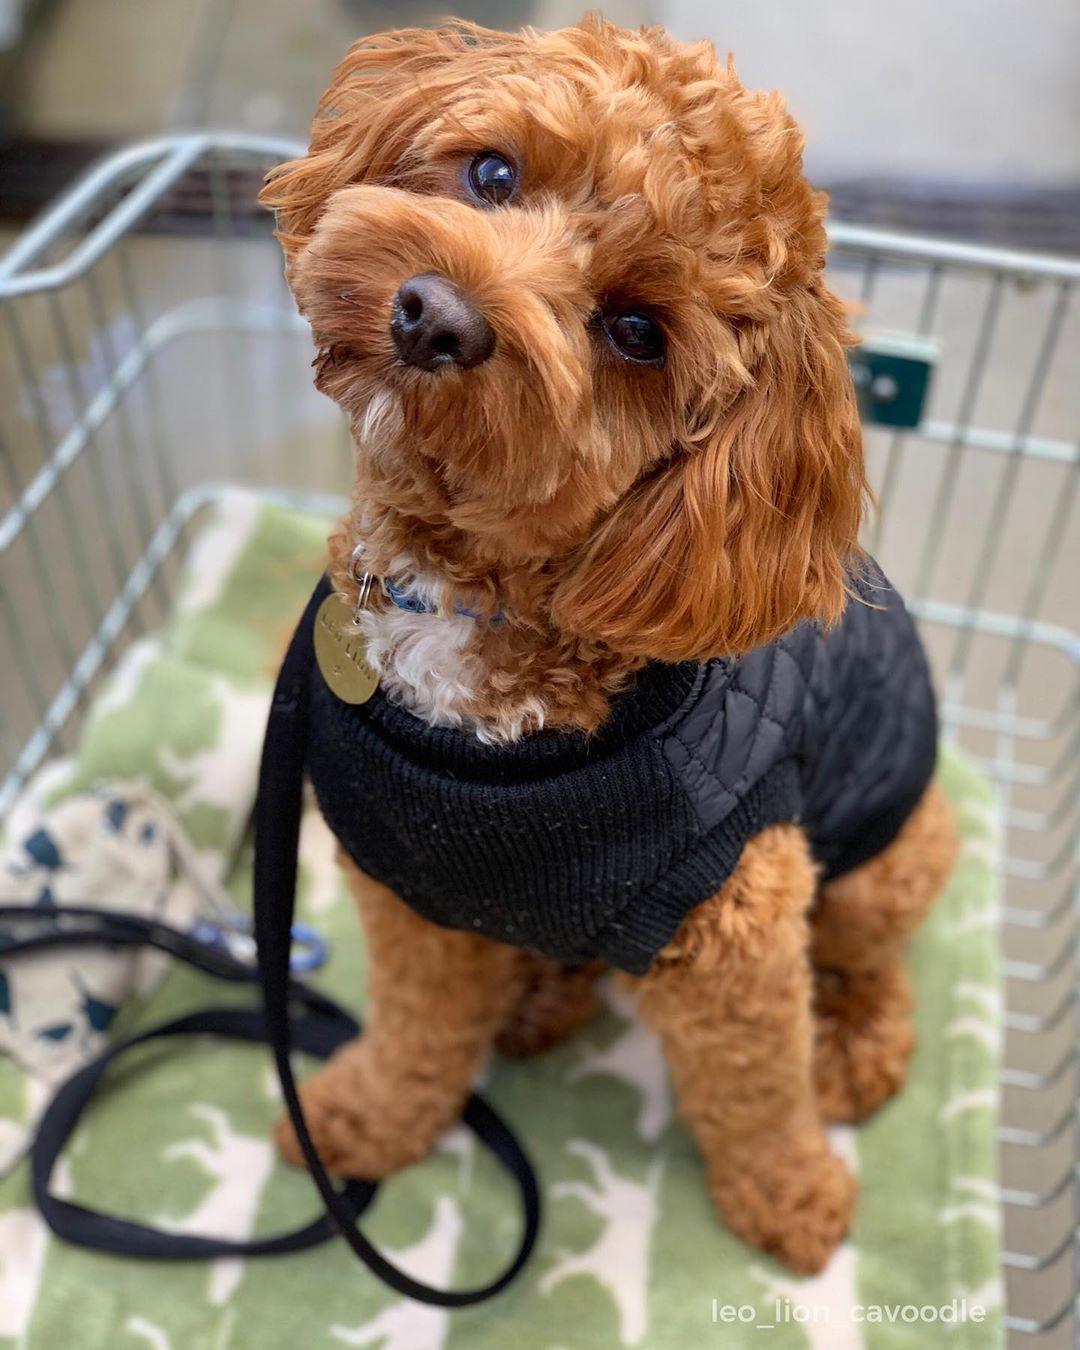 Leo Lion On Instagram Bringing Style To Bunnings Style Dogsatbunnings Goodshopper Dogsintrolleys Teddybeardog Cavoodle Cavapoo Bark Pawfectp